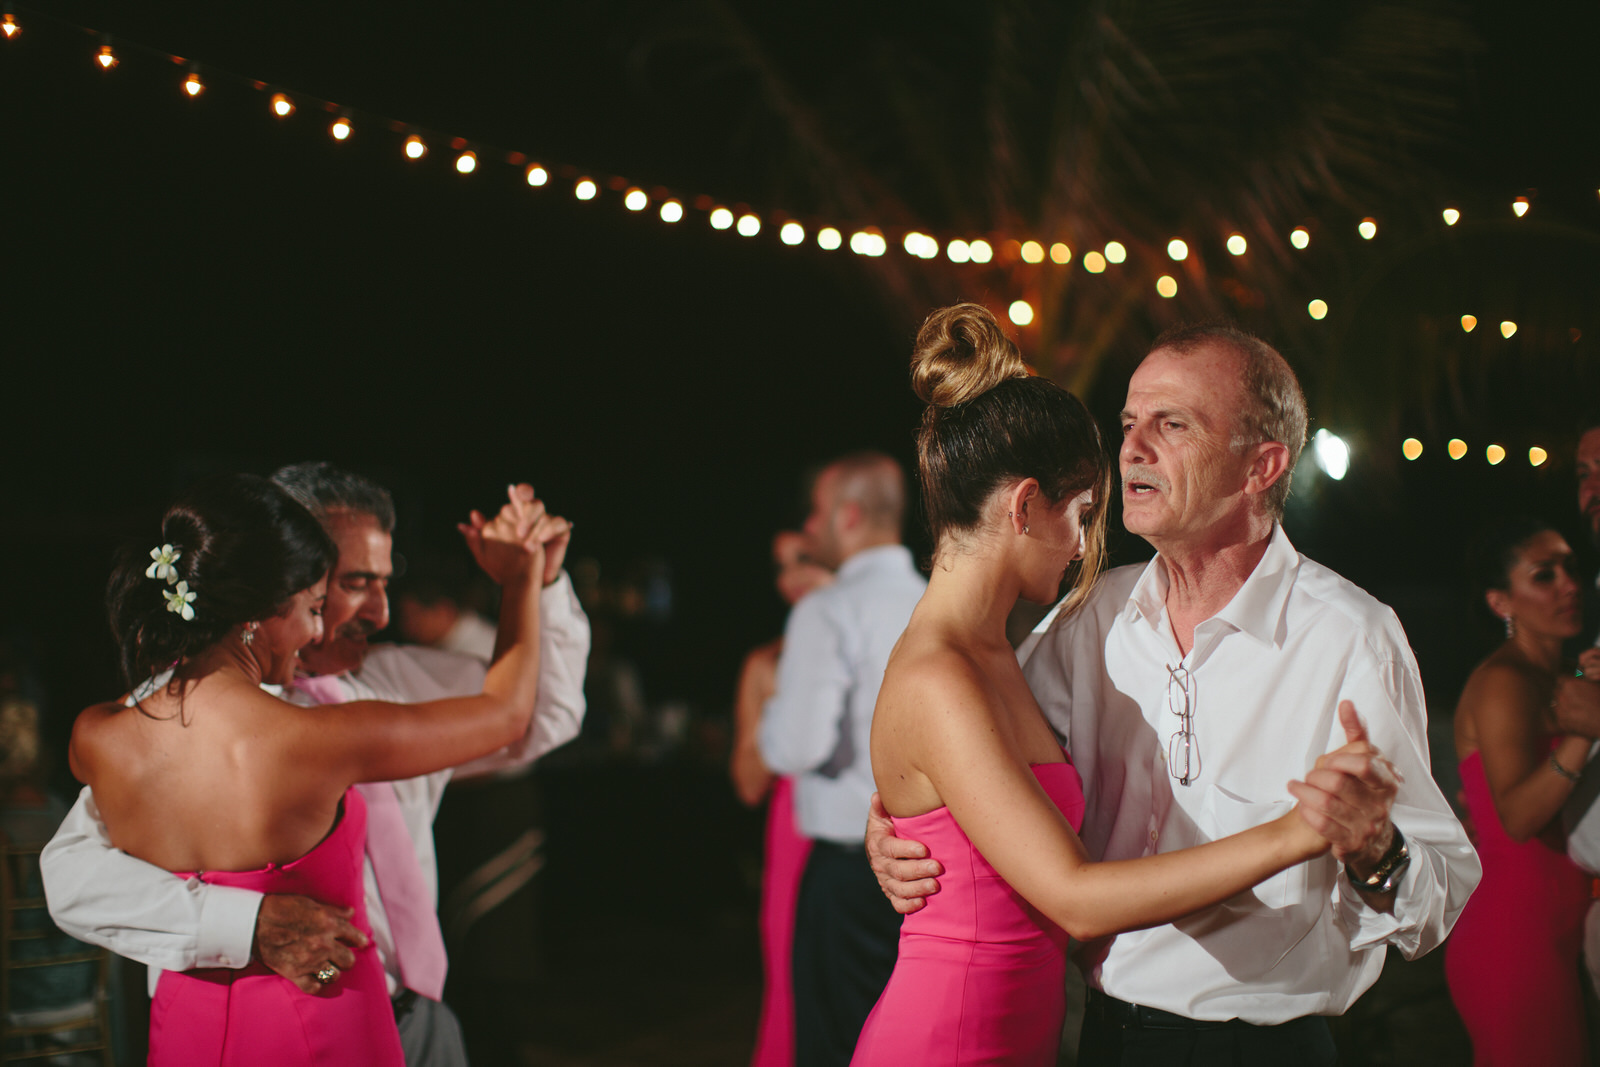 dancing_wedding_reception_tropical_paradise_destination_weddings.jpg